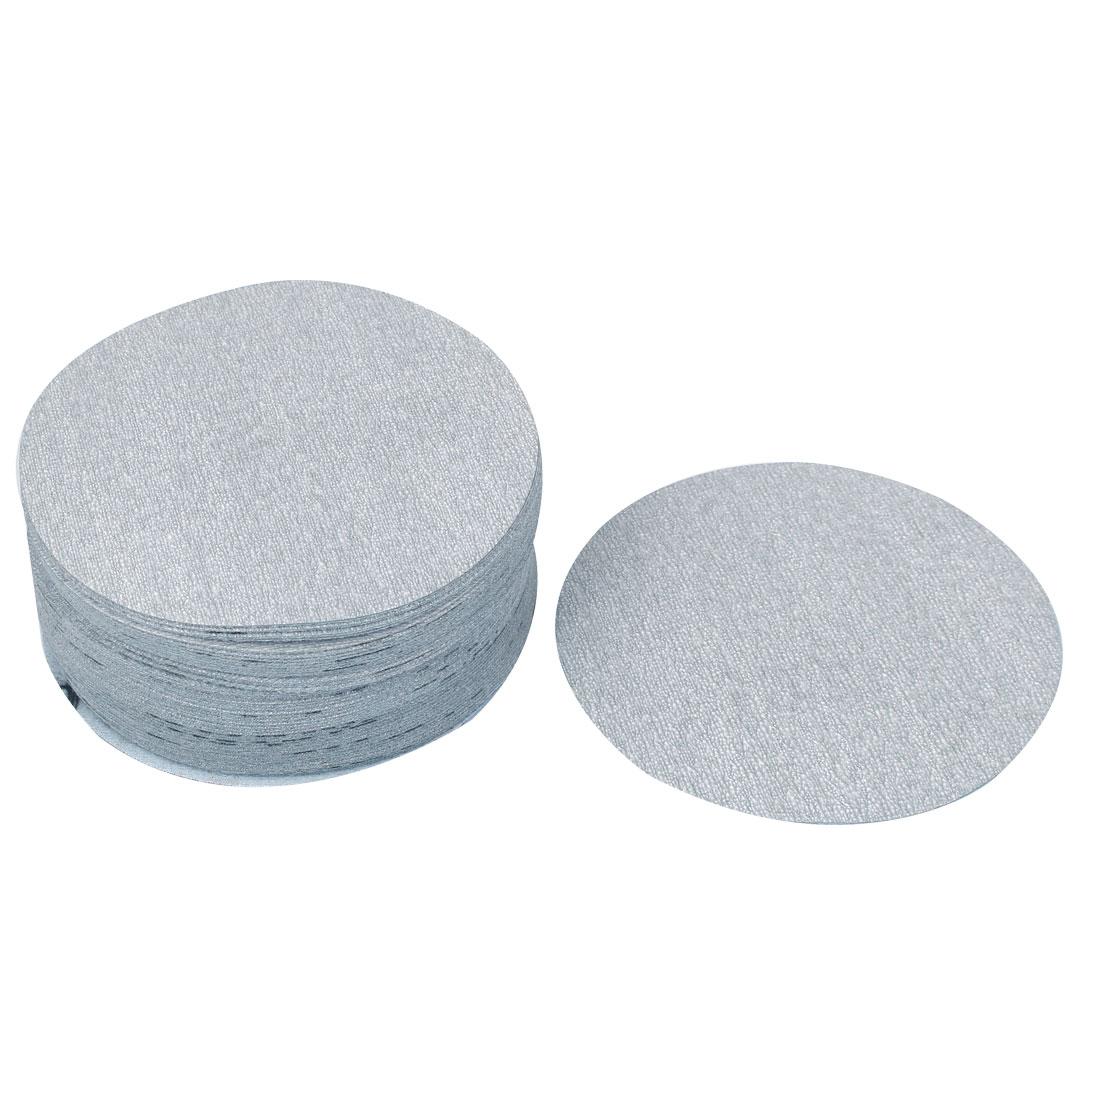 5inch Dia Round Dry Abrasive Sanding Sandpaper Disc 1000 Grit 50pcs